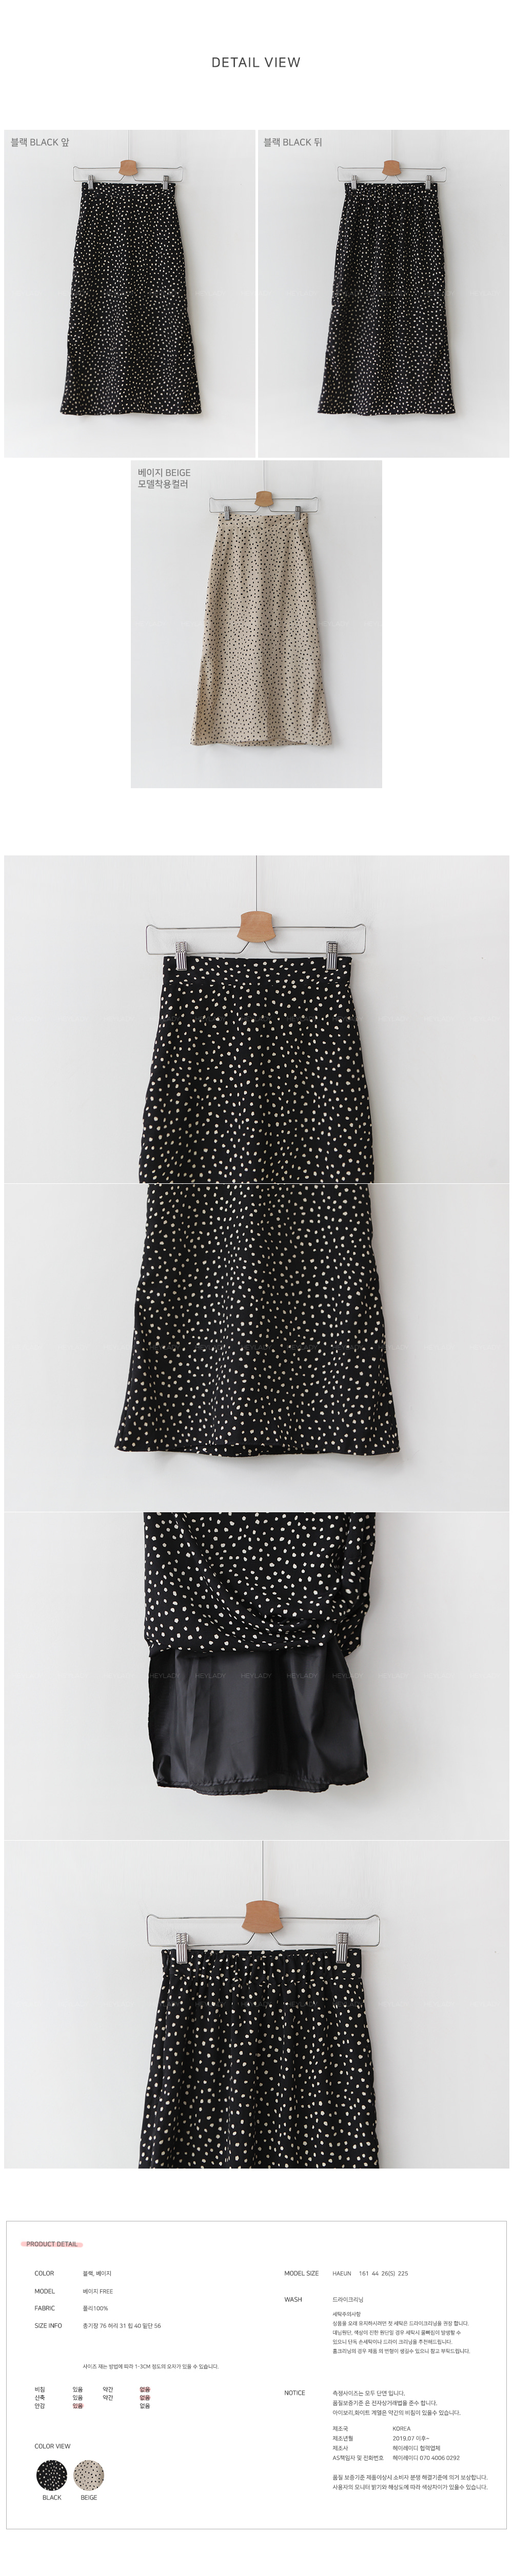 Lily dot skirt